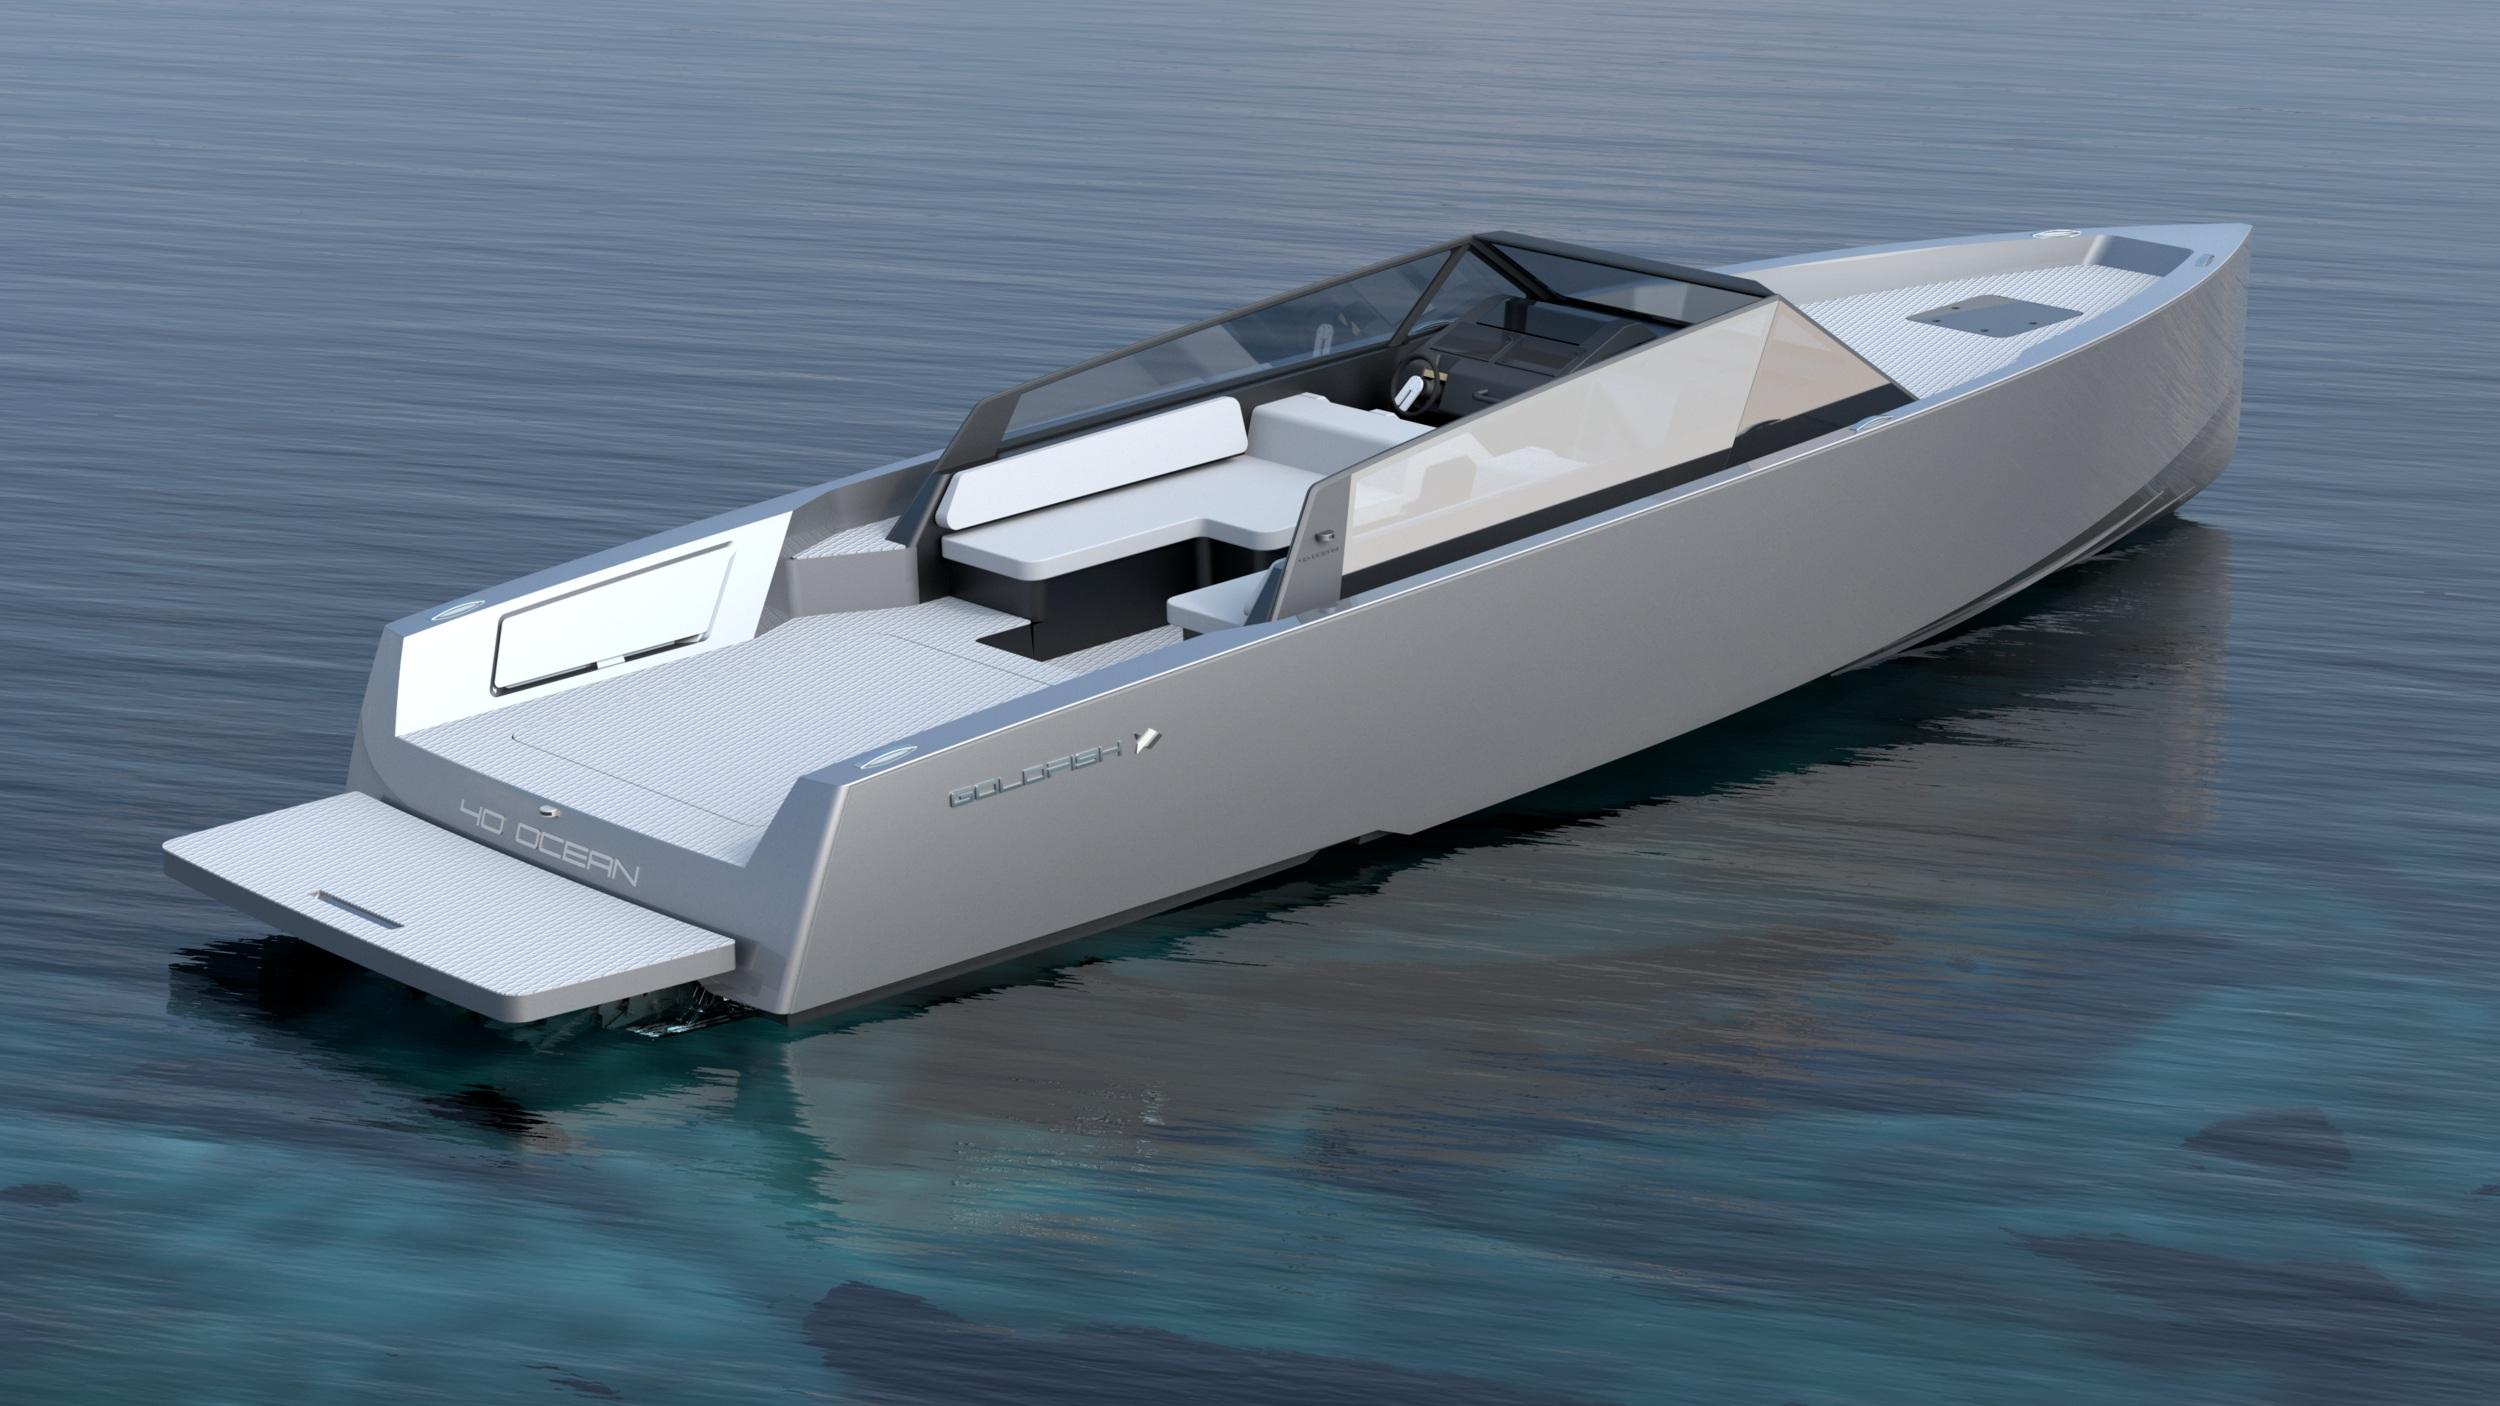 goldfish-boat-ocean-40-pivot-produktdesign-vray-rhino